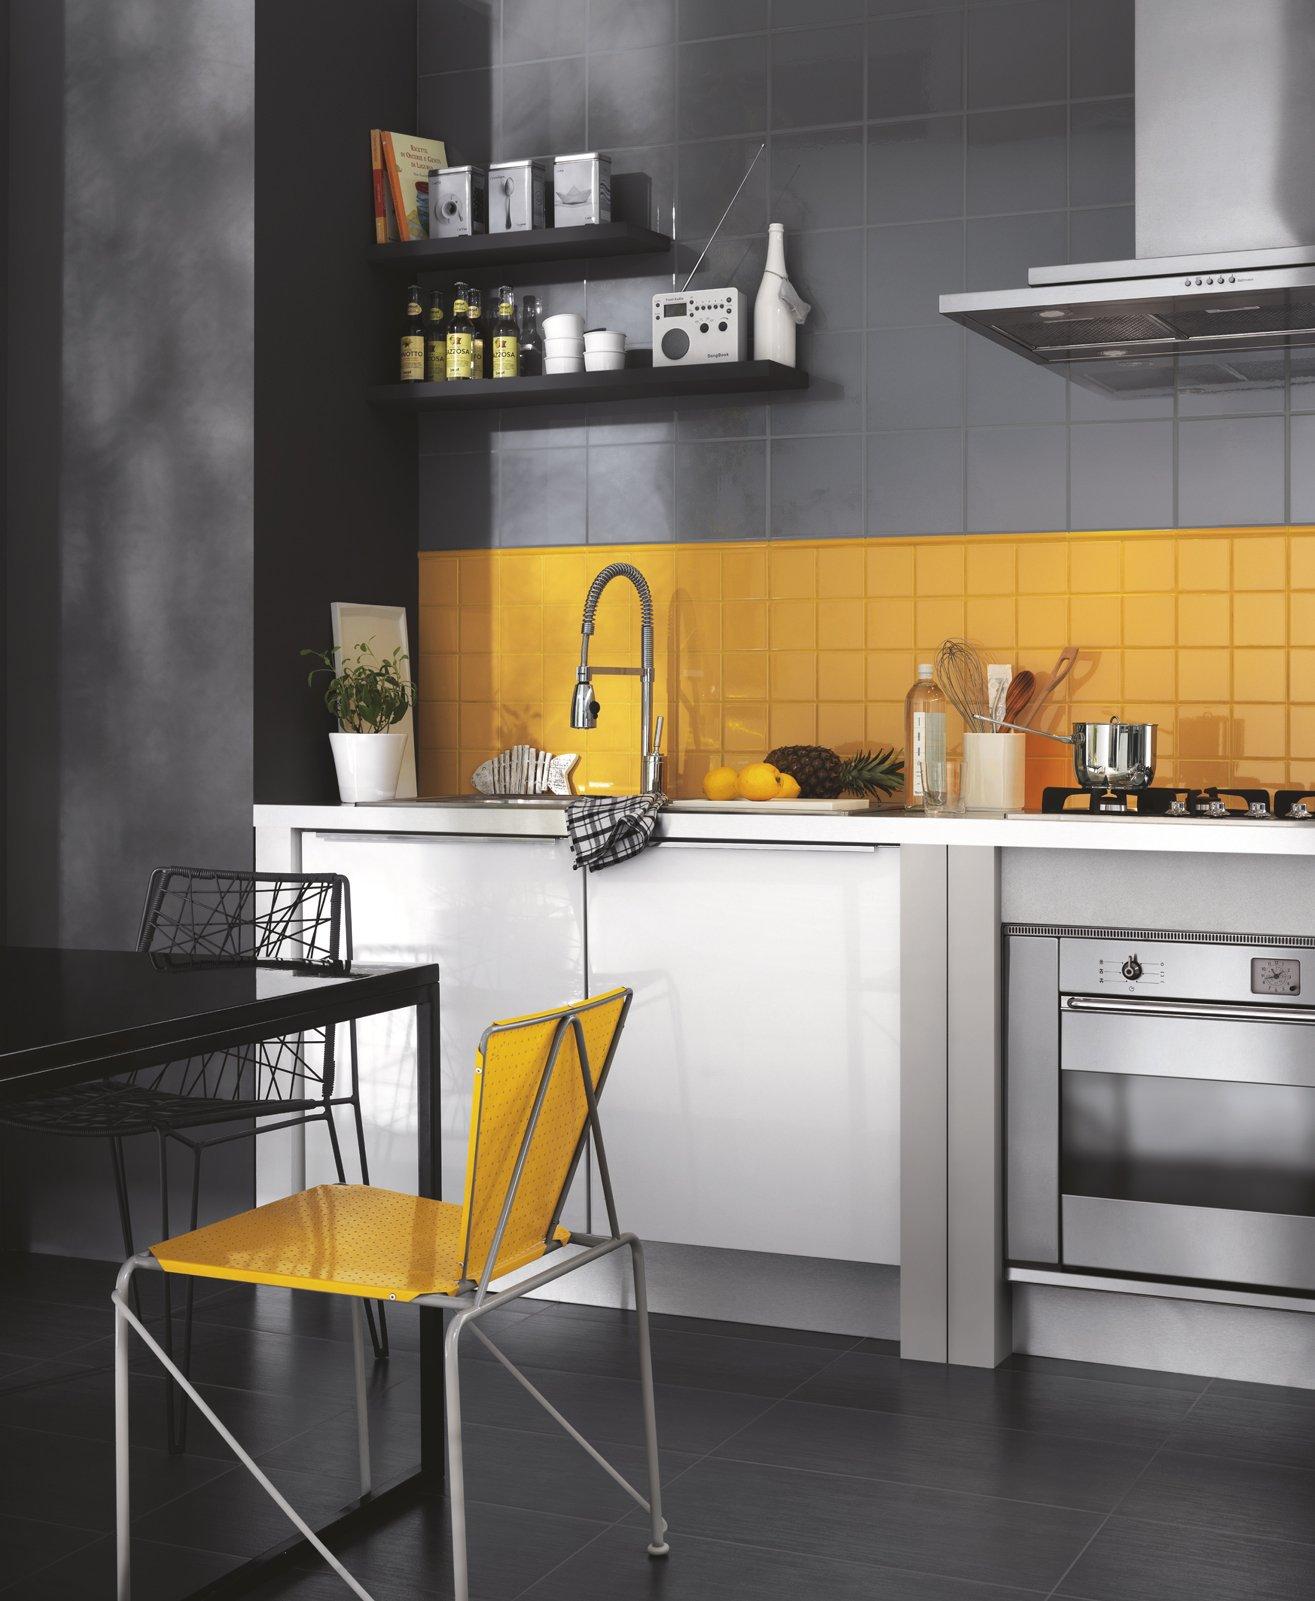 Piastrelle cucina materiali prezzi e soluzioni consigliate - Mattonelle da cucina moderne ...